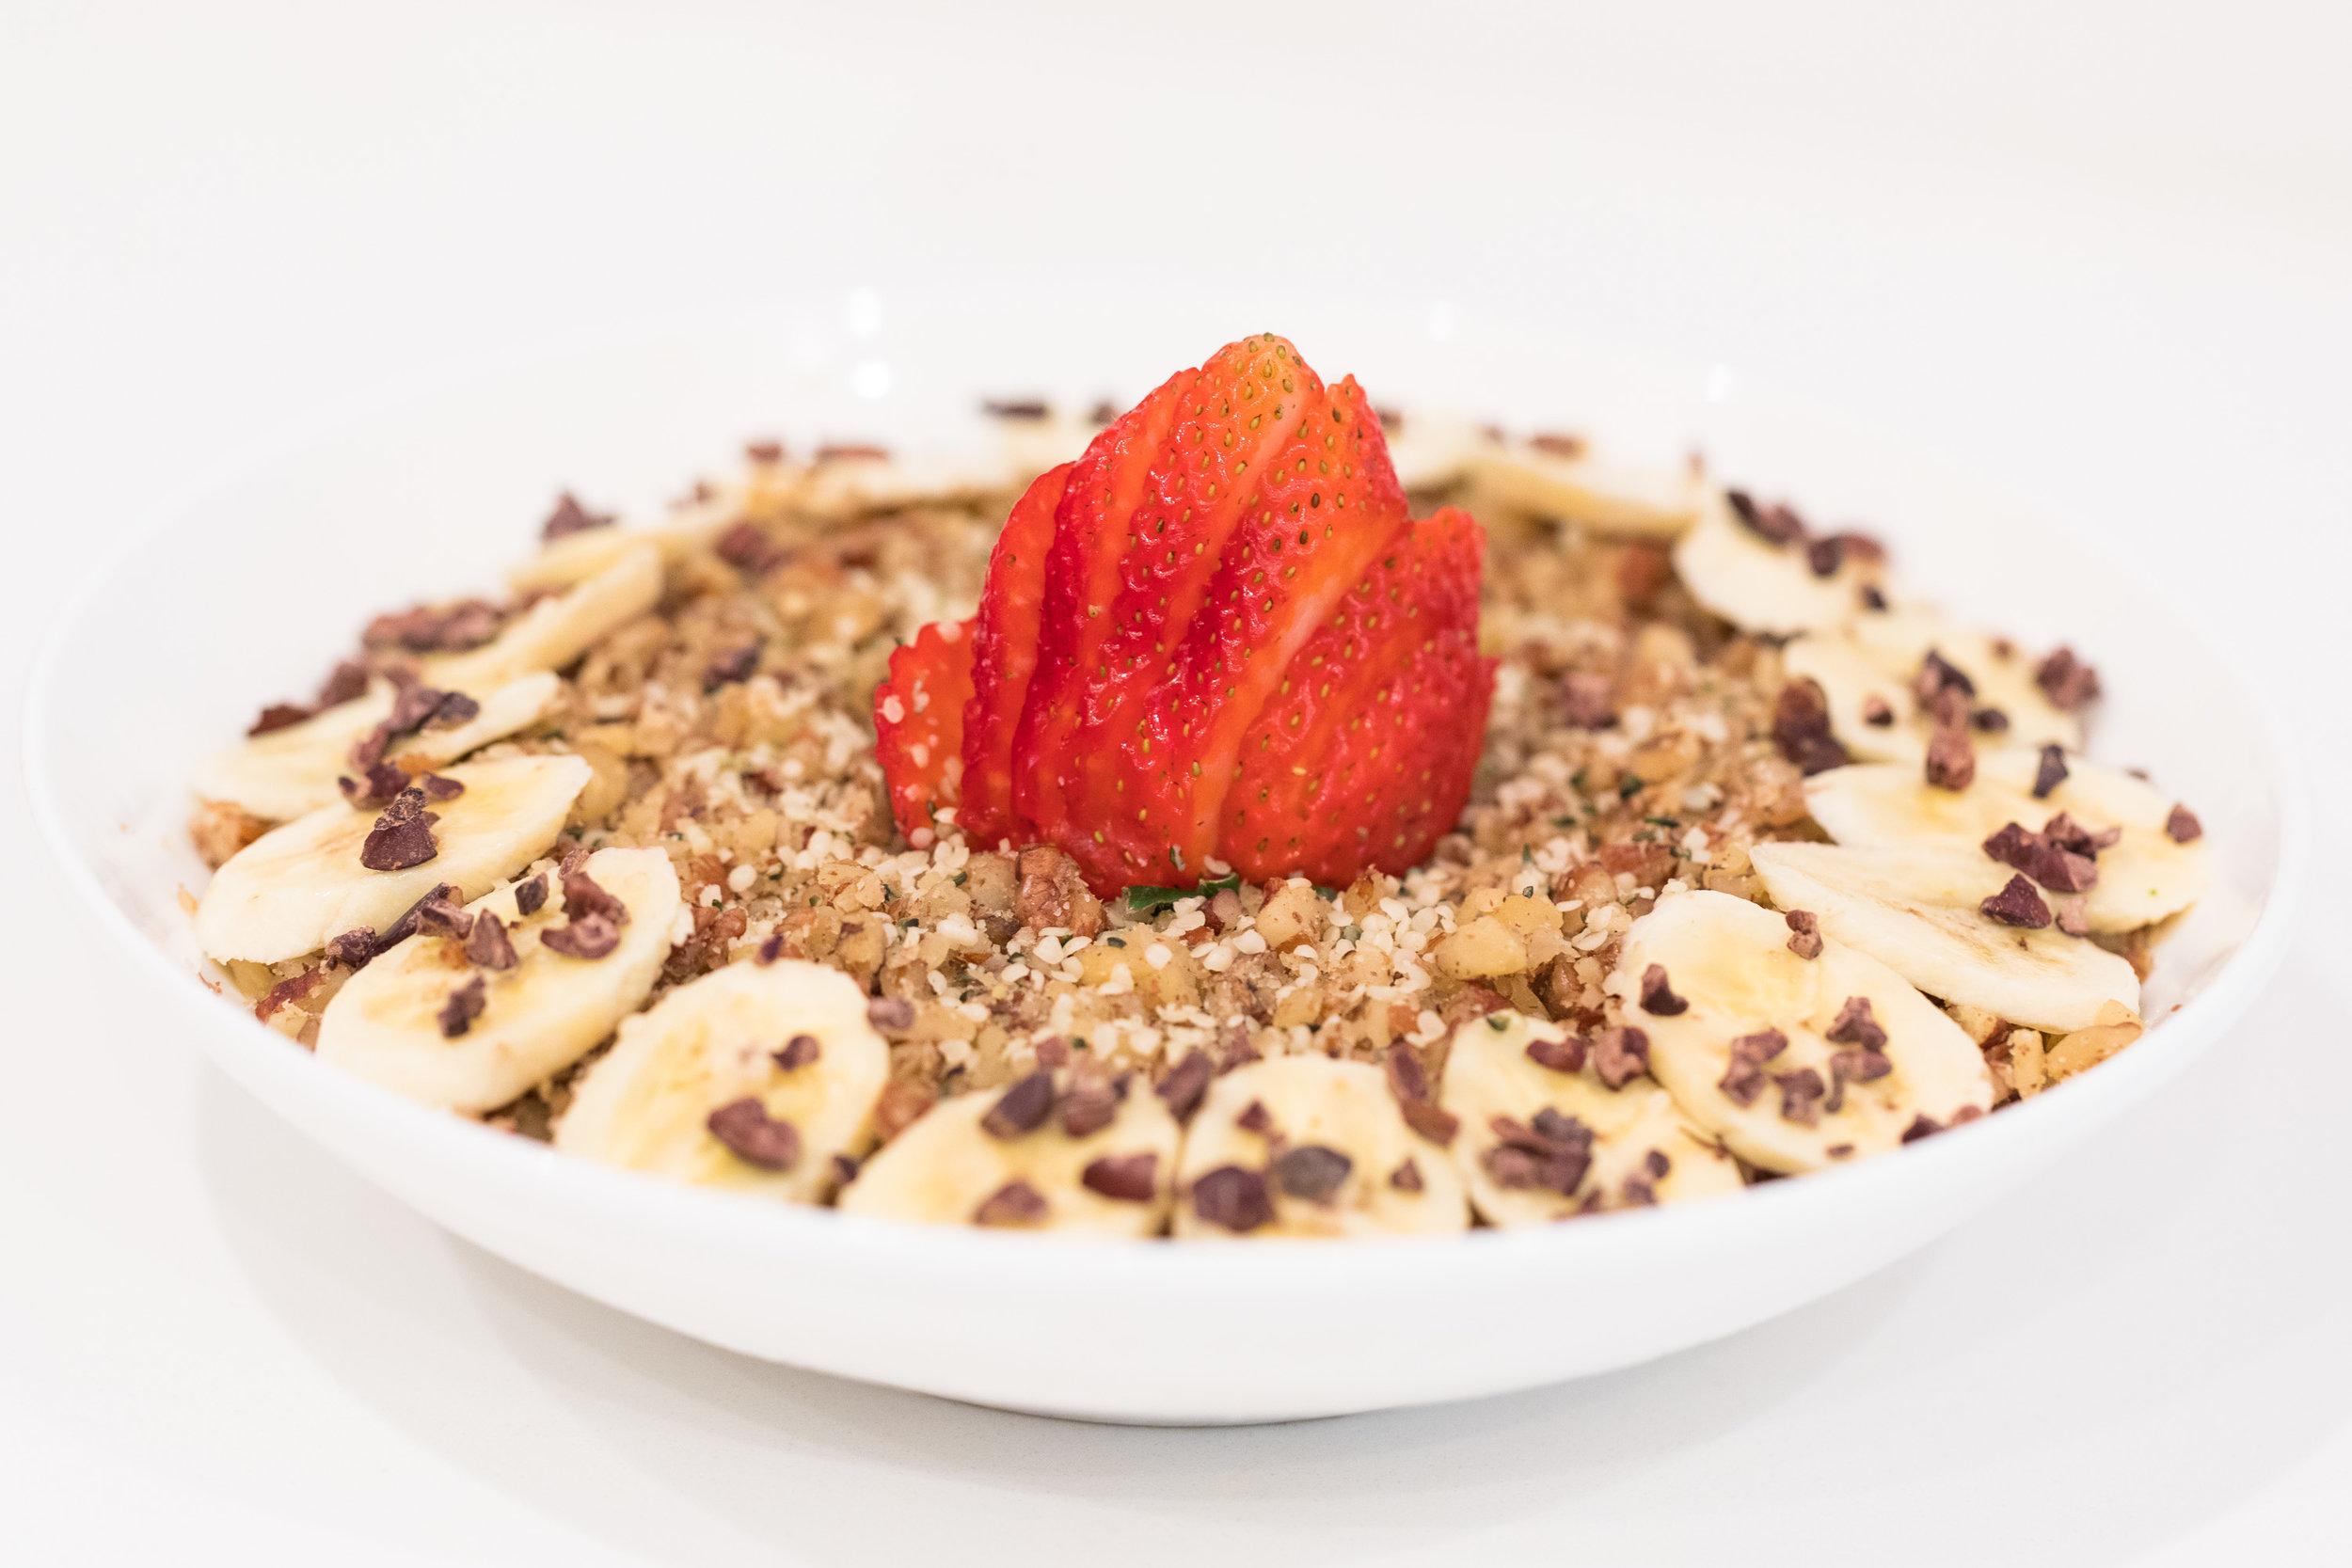 maka-vegan-gluten-free-cafe-breakfast-bowl-13.jpg